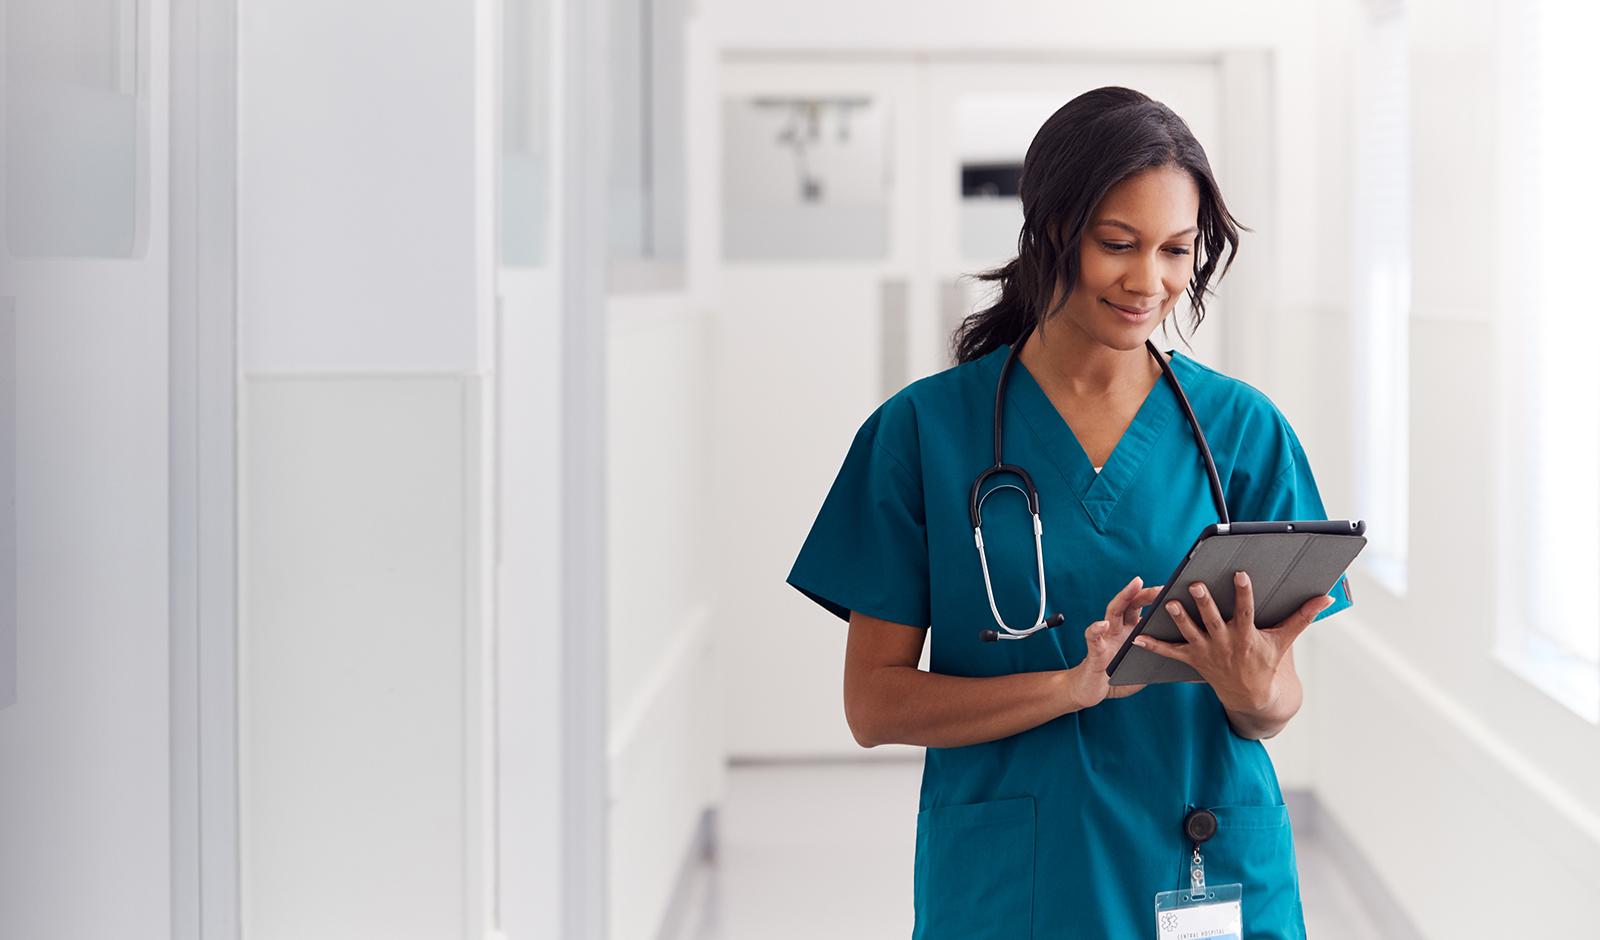 fascinating-history-of-nursing-nurse-main-image